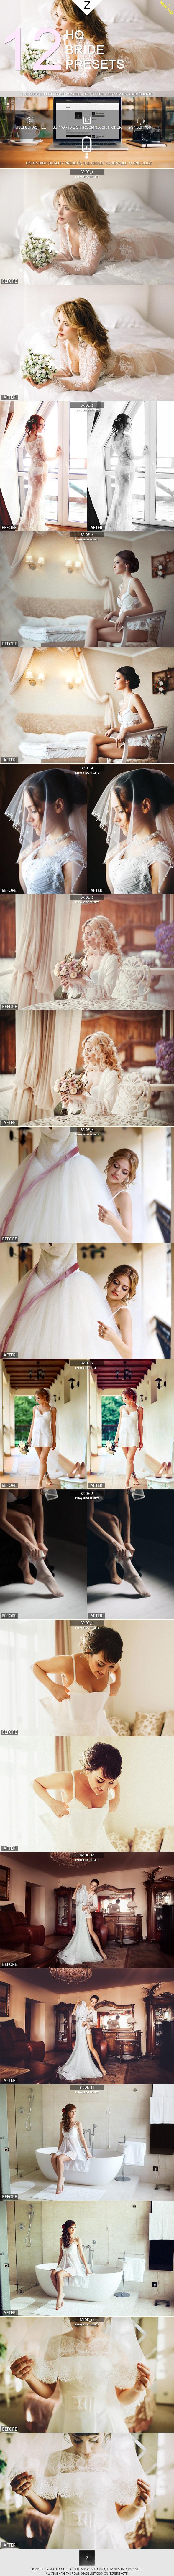 12 HQ Bride Presets - Wedding Lightroom Presets